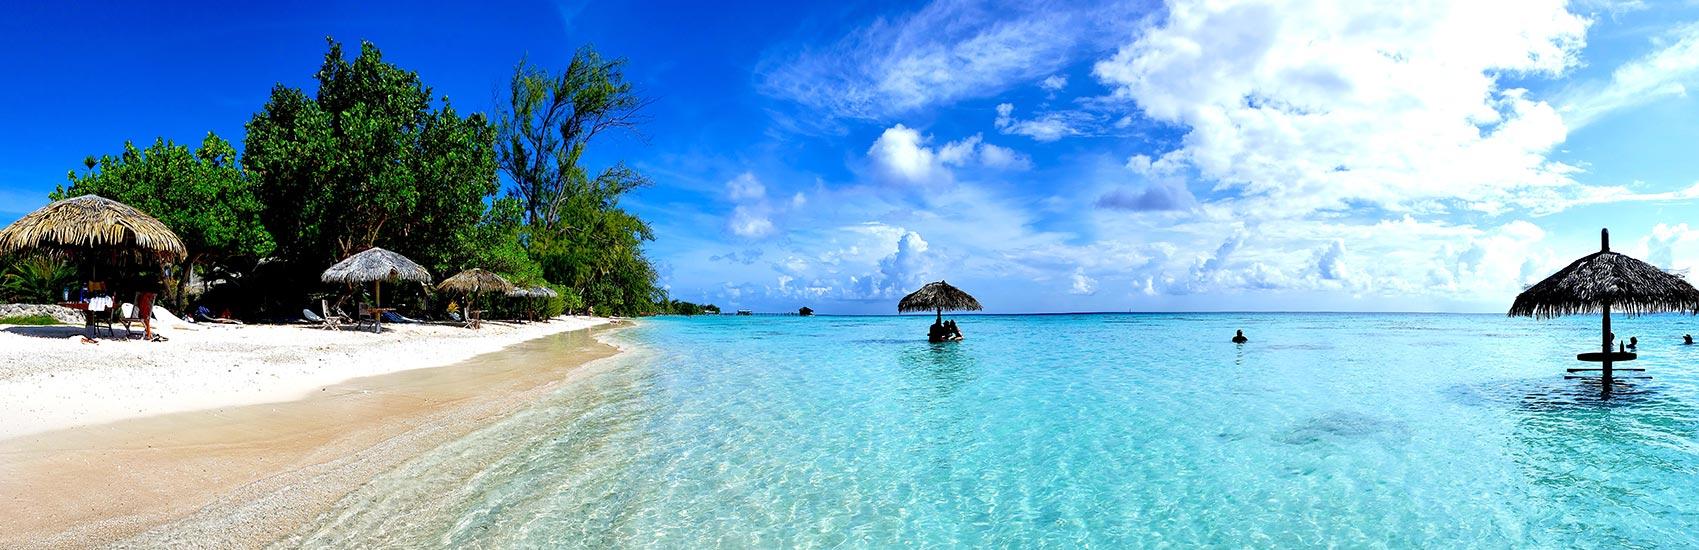 Navigate the World with Regent Seven Seas Cruises® 2